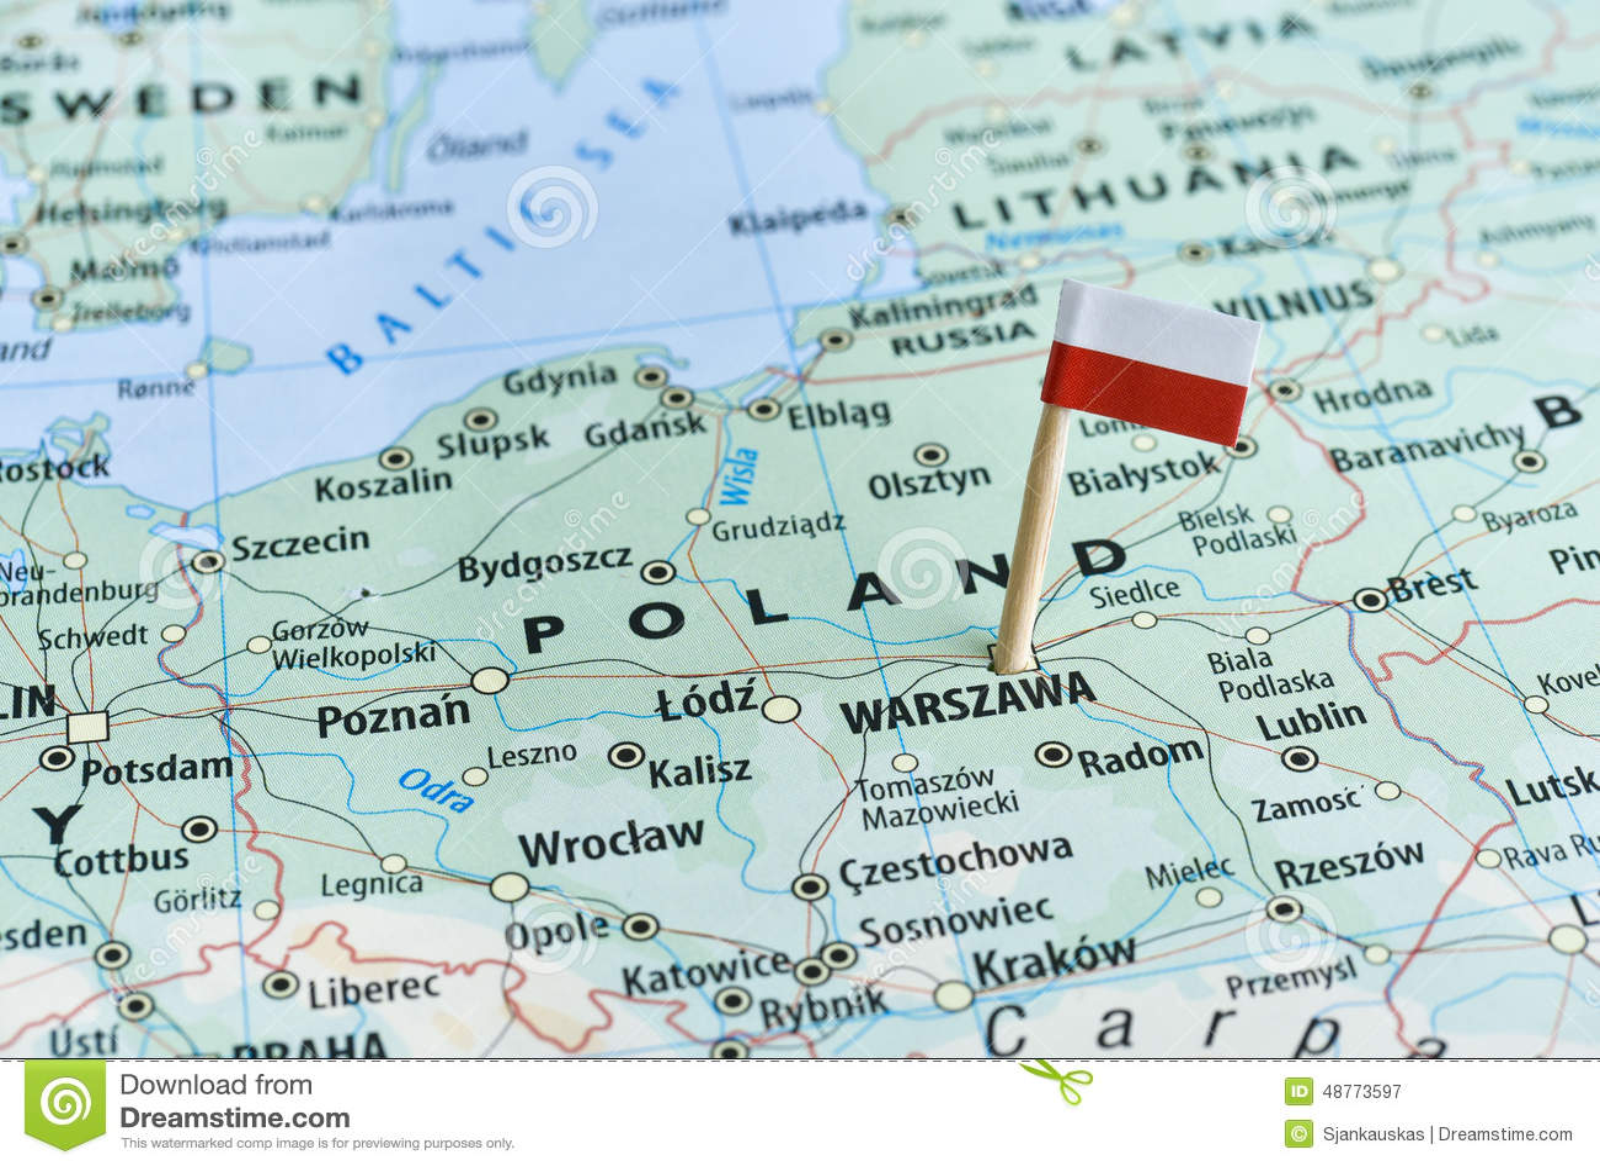 Poland map flag pin stock image. Image of european, borders - 48773597